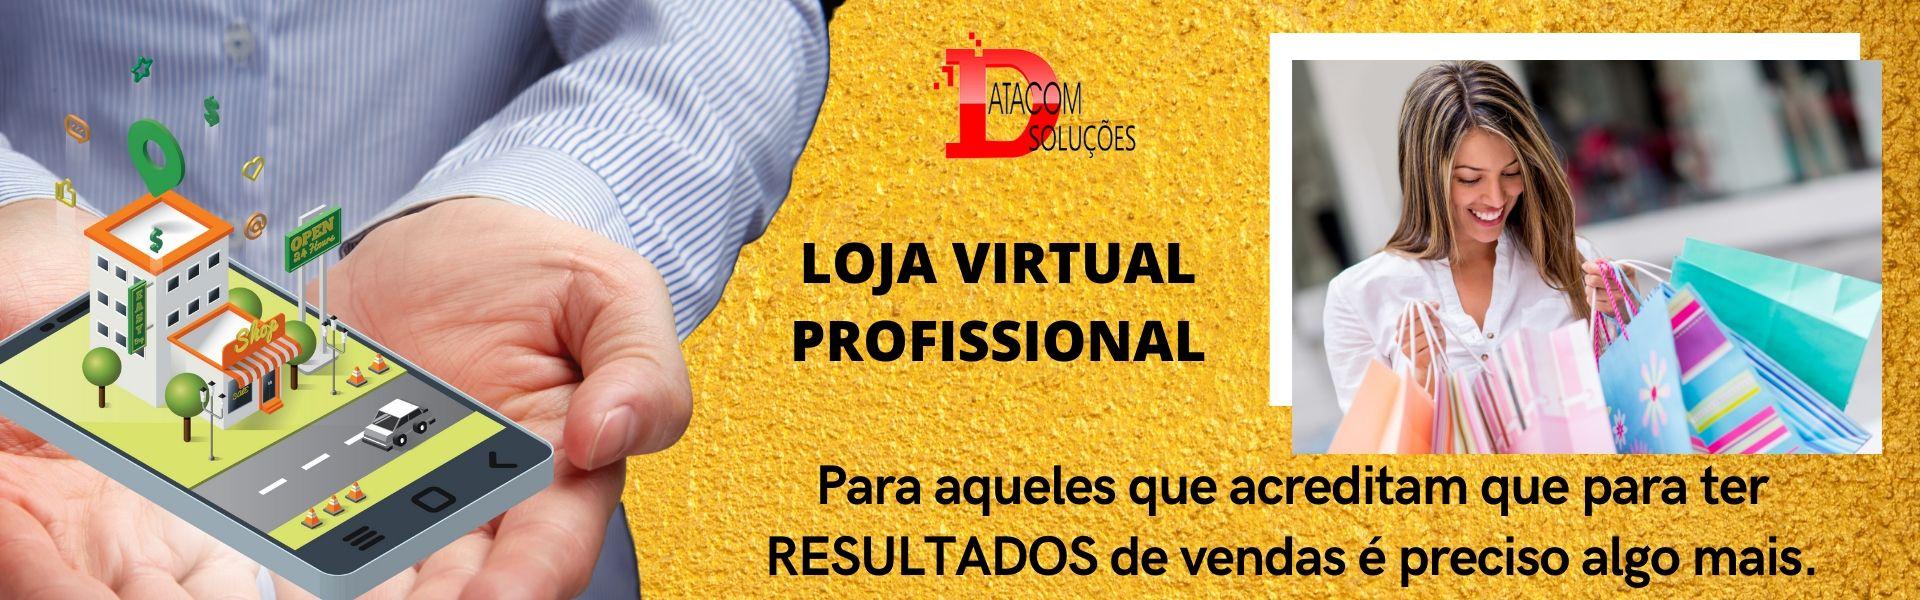 loja-virtual-profissional-datacom-solucoes-ecommerce